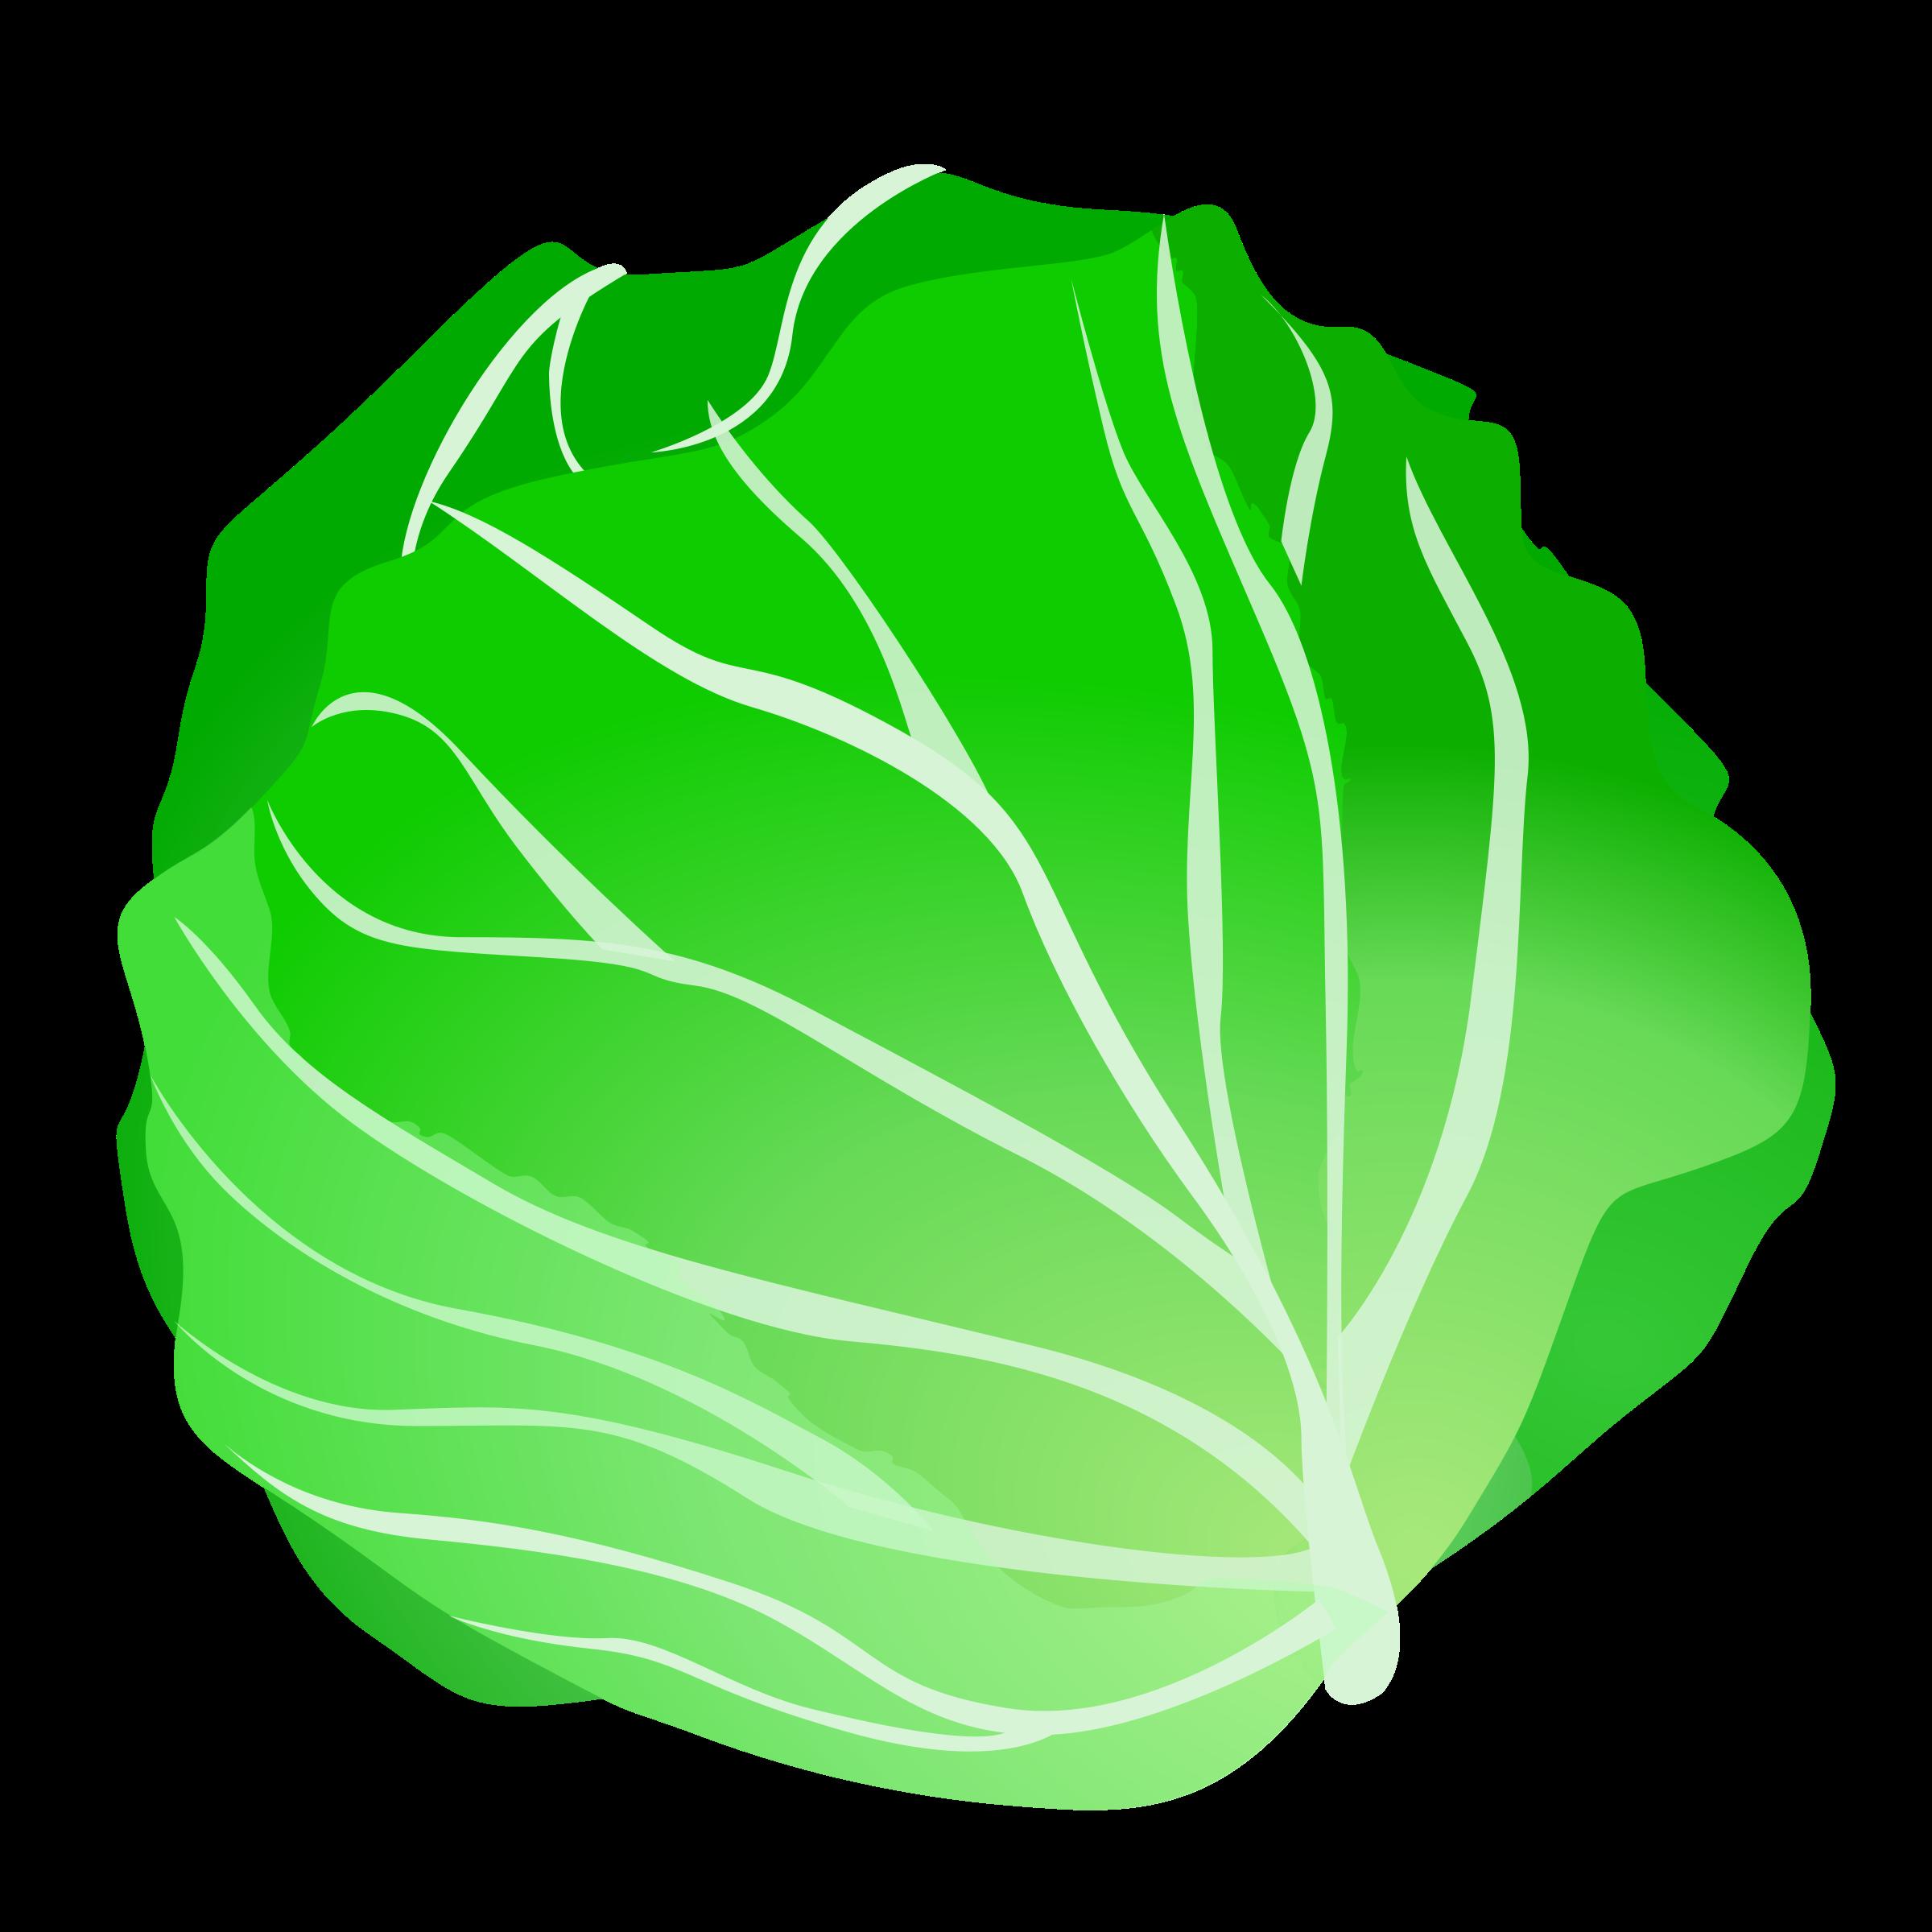 Head Of Lettuce Clipart Transparent Clip-Head of lettuce clipart transparent clipartall-7